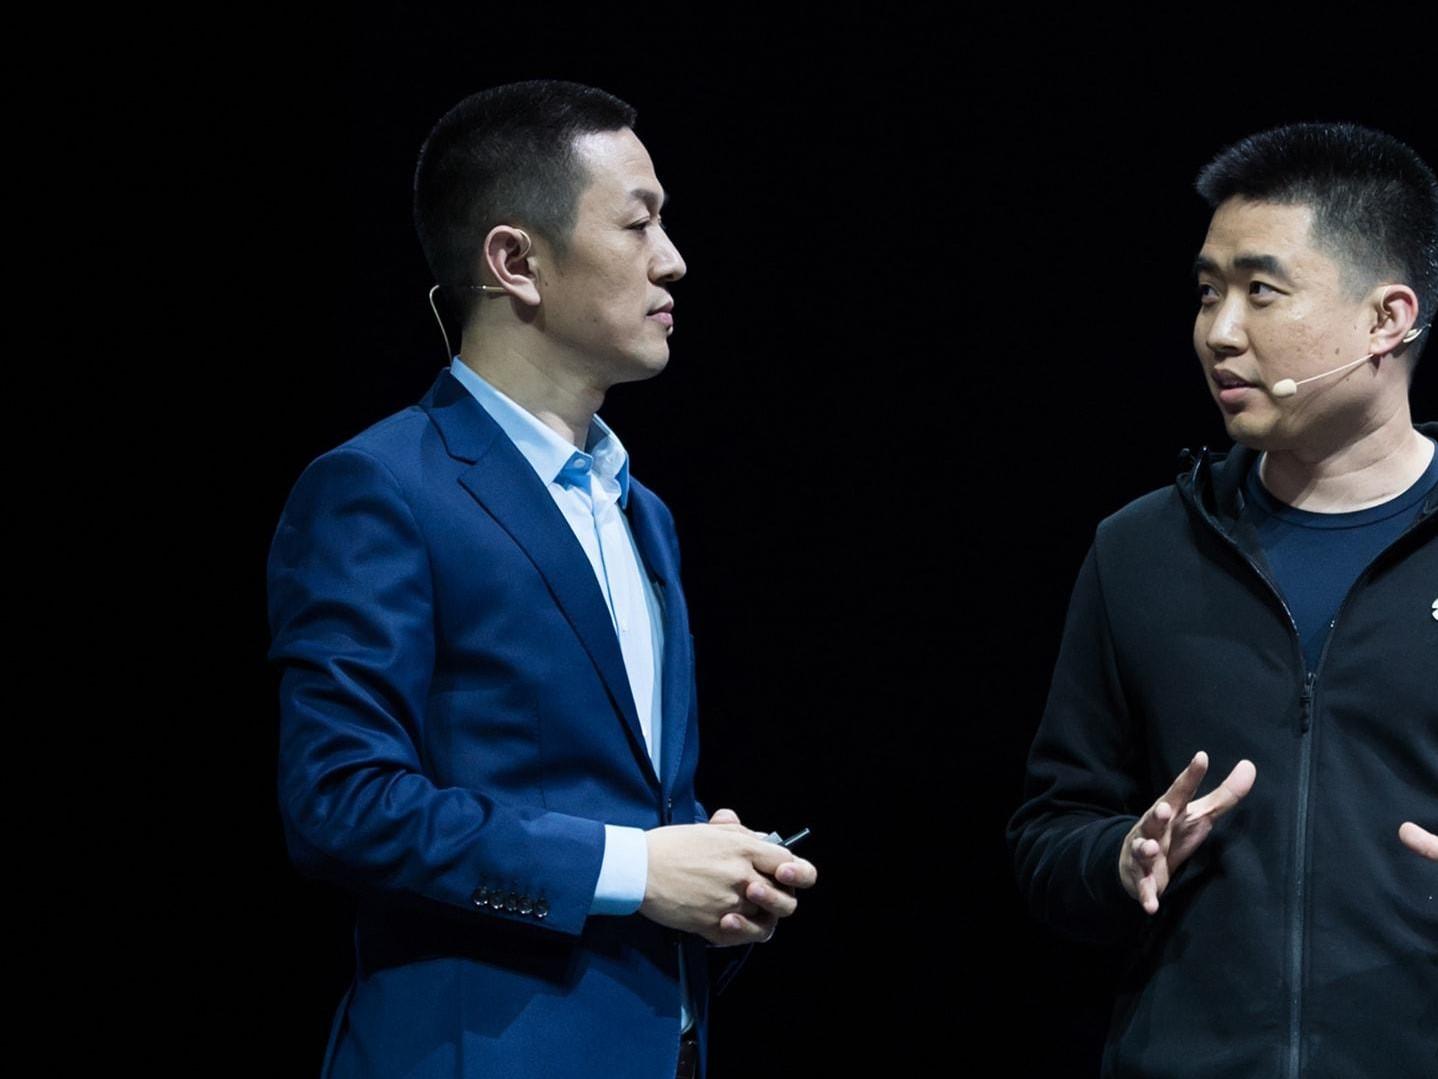 NIO CEO William Li Responds to Layoff Rumors